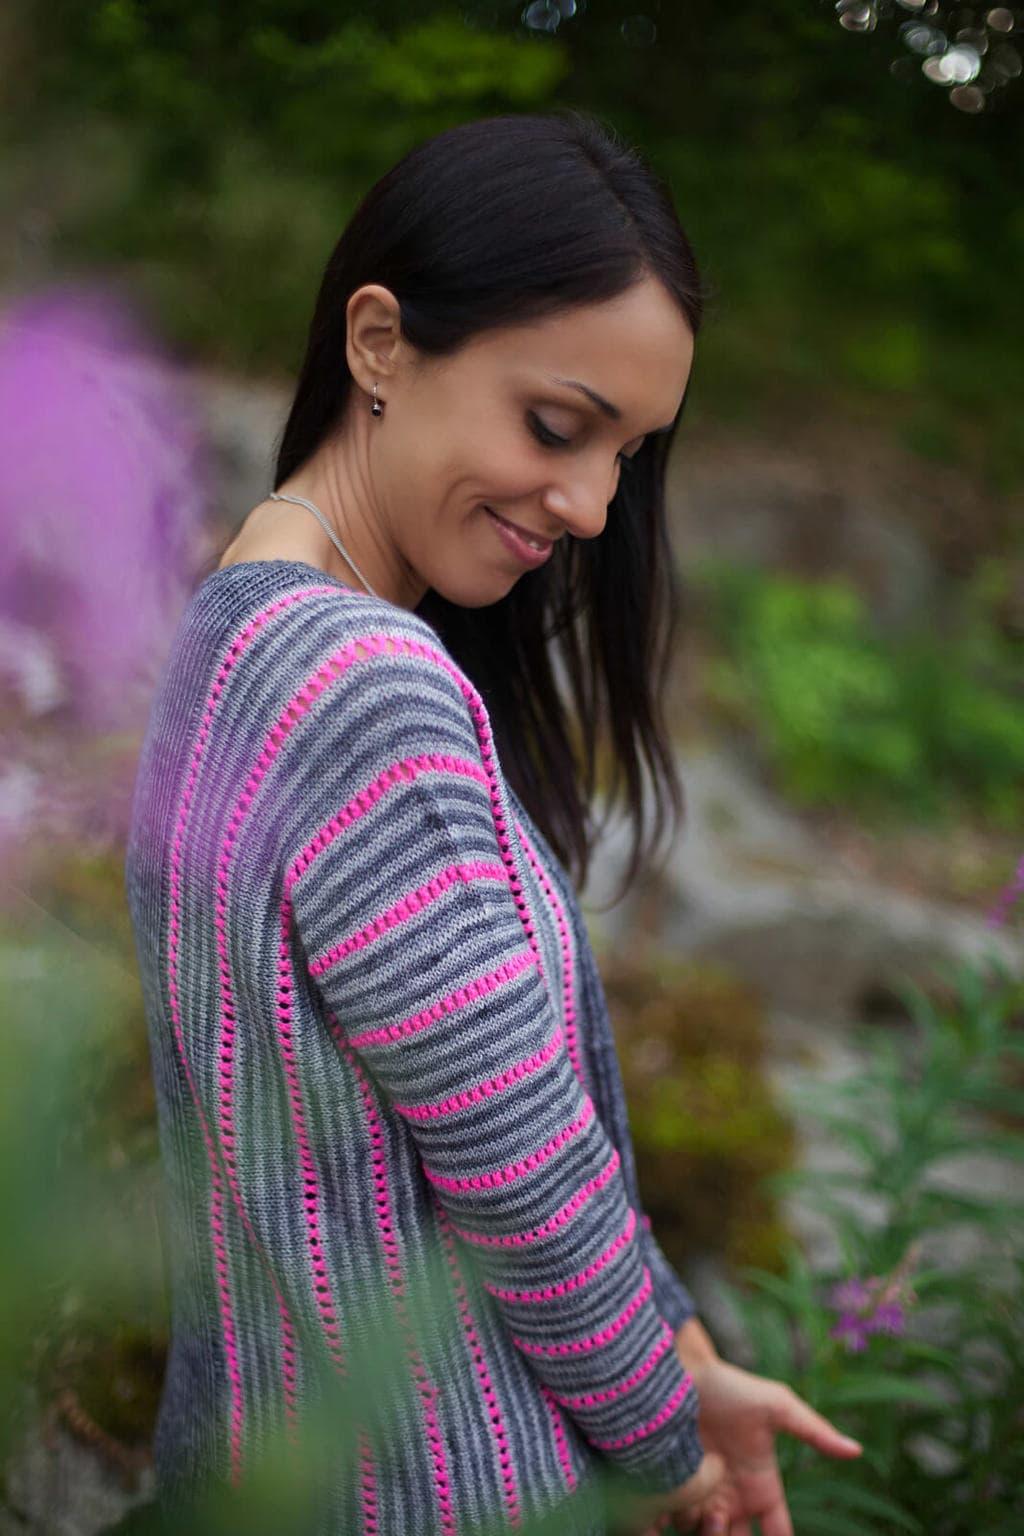 Episode 046: Joji Locatelli on Knitwear Design and